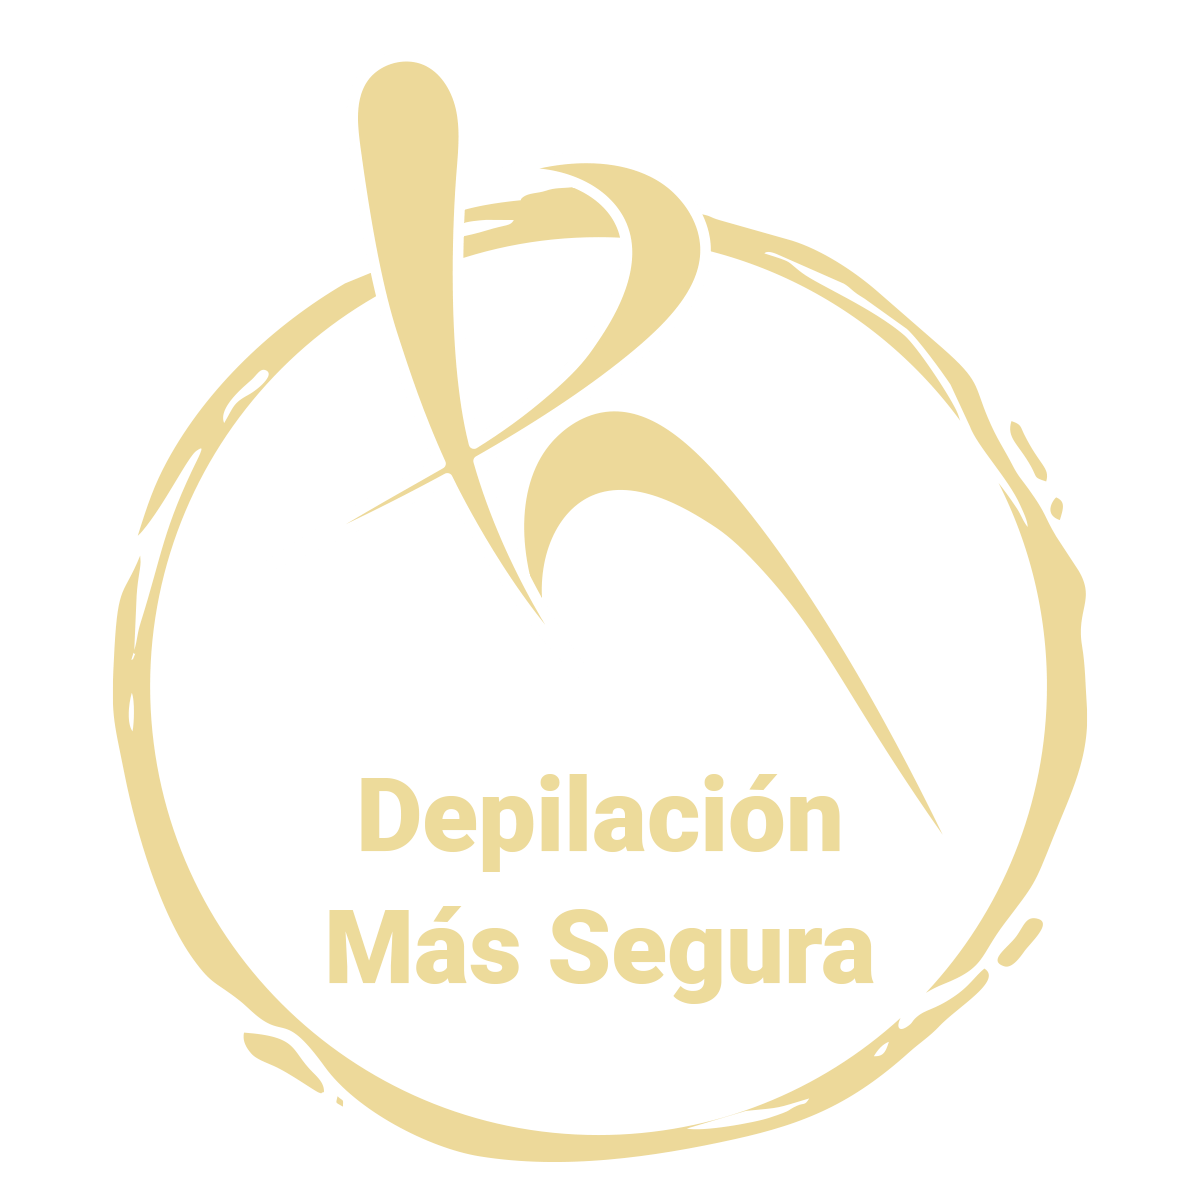 Centros de Depilación Láser SHR Reme Aguilar en Murcia y Molina de Segura - Servicios Hombres